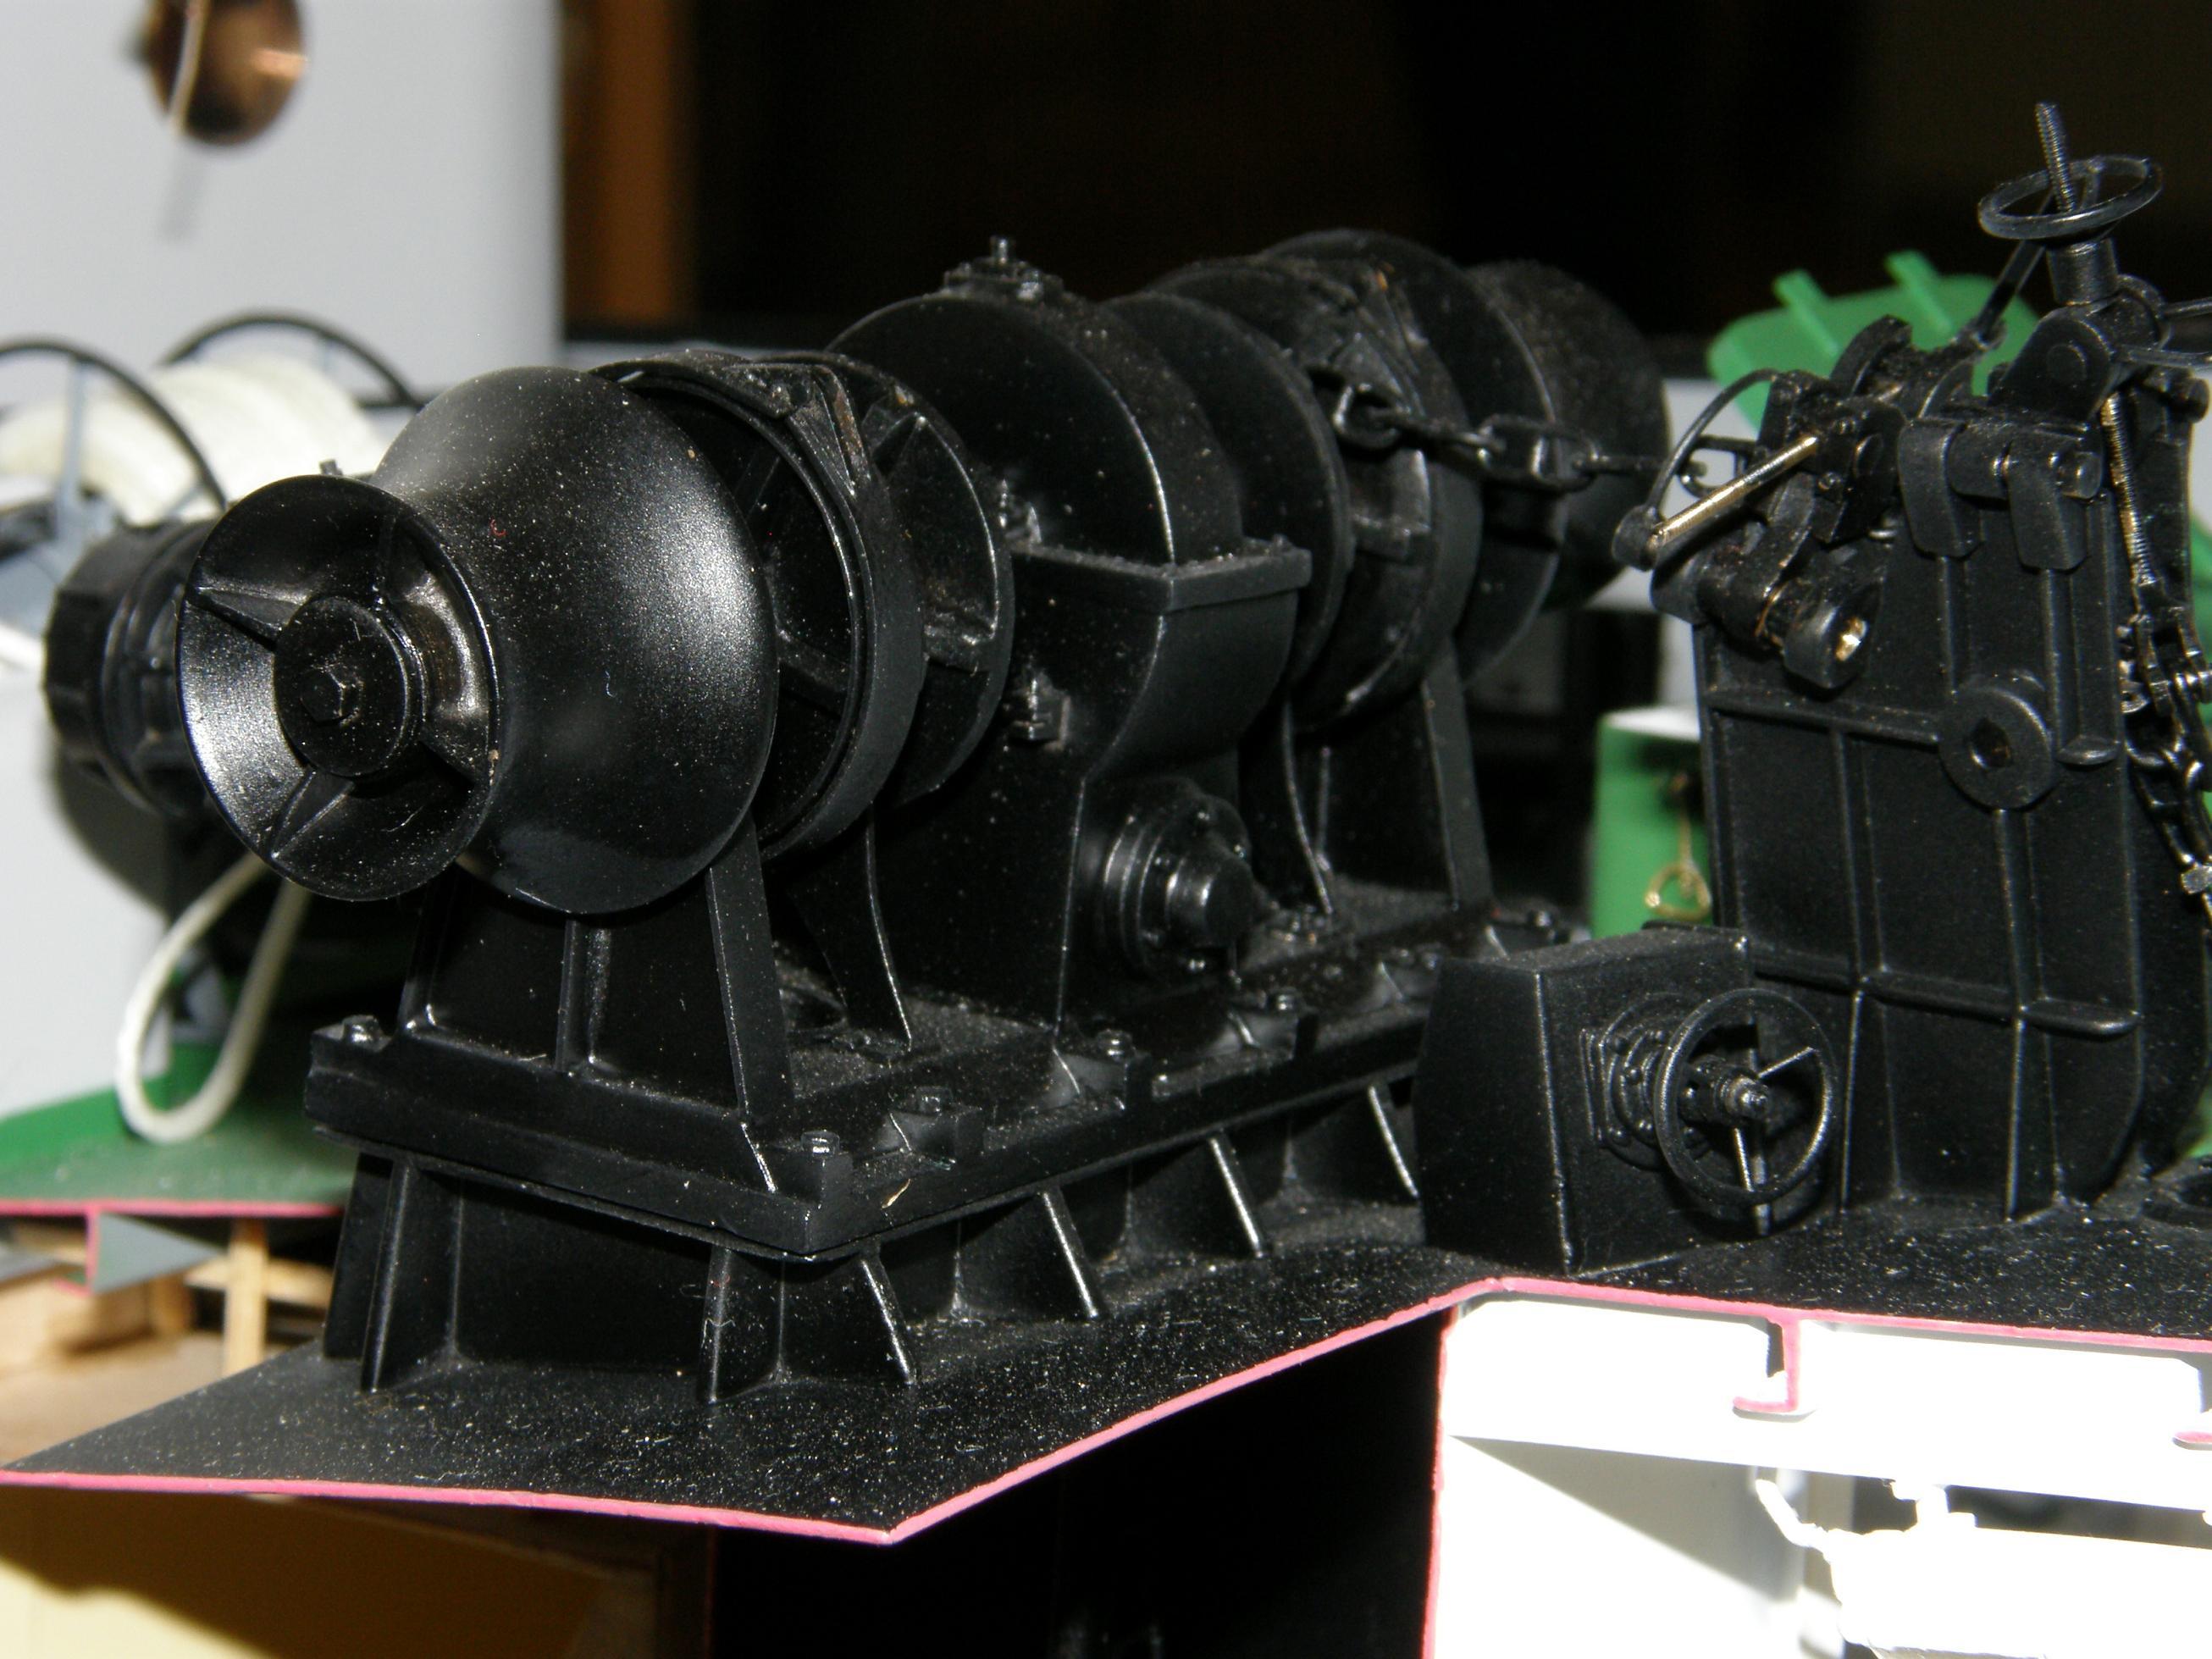 Ares%2031.jpg